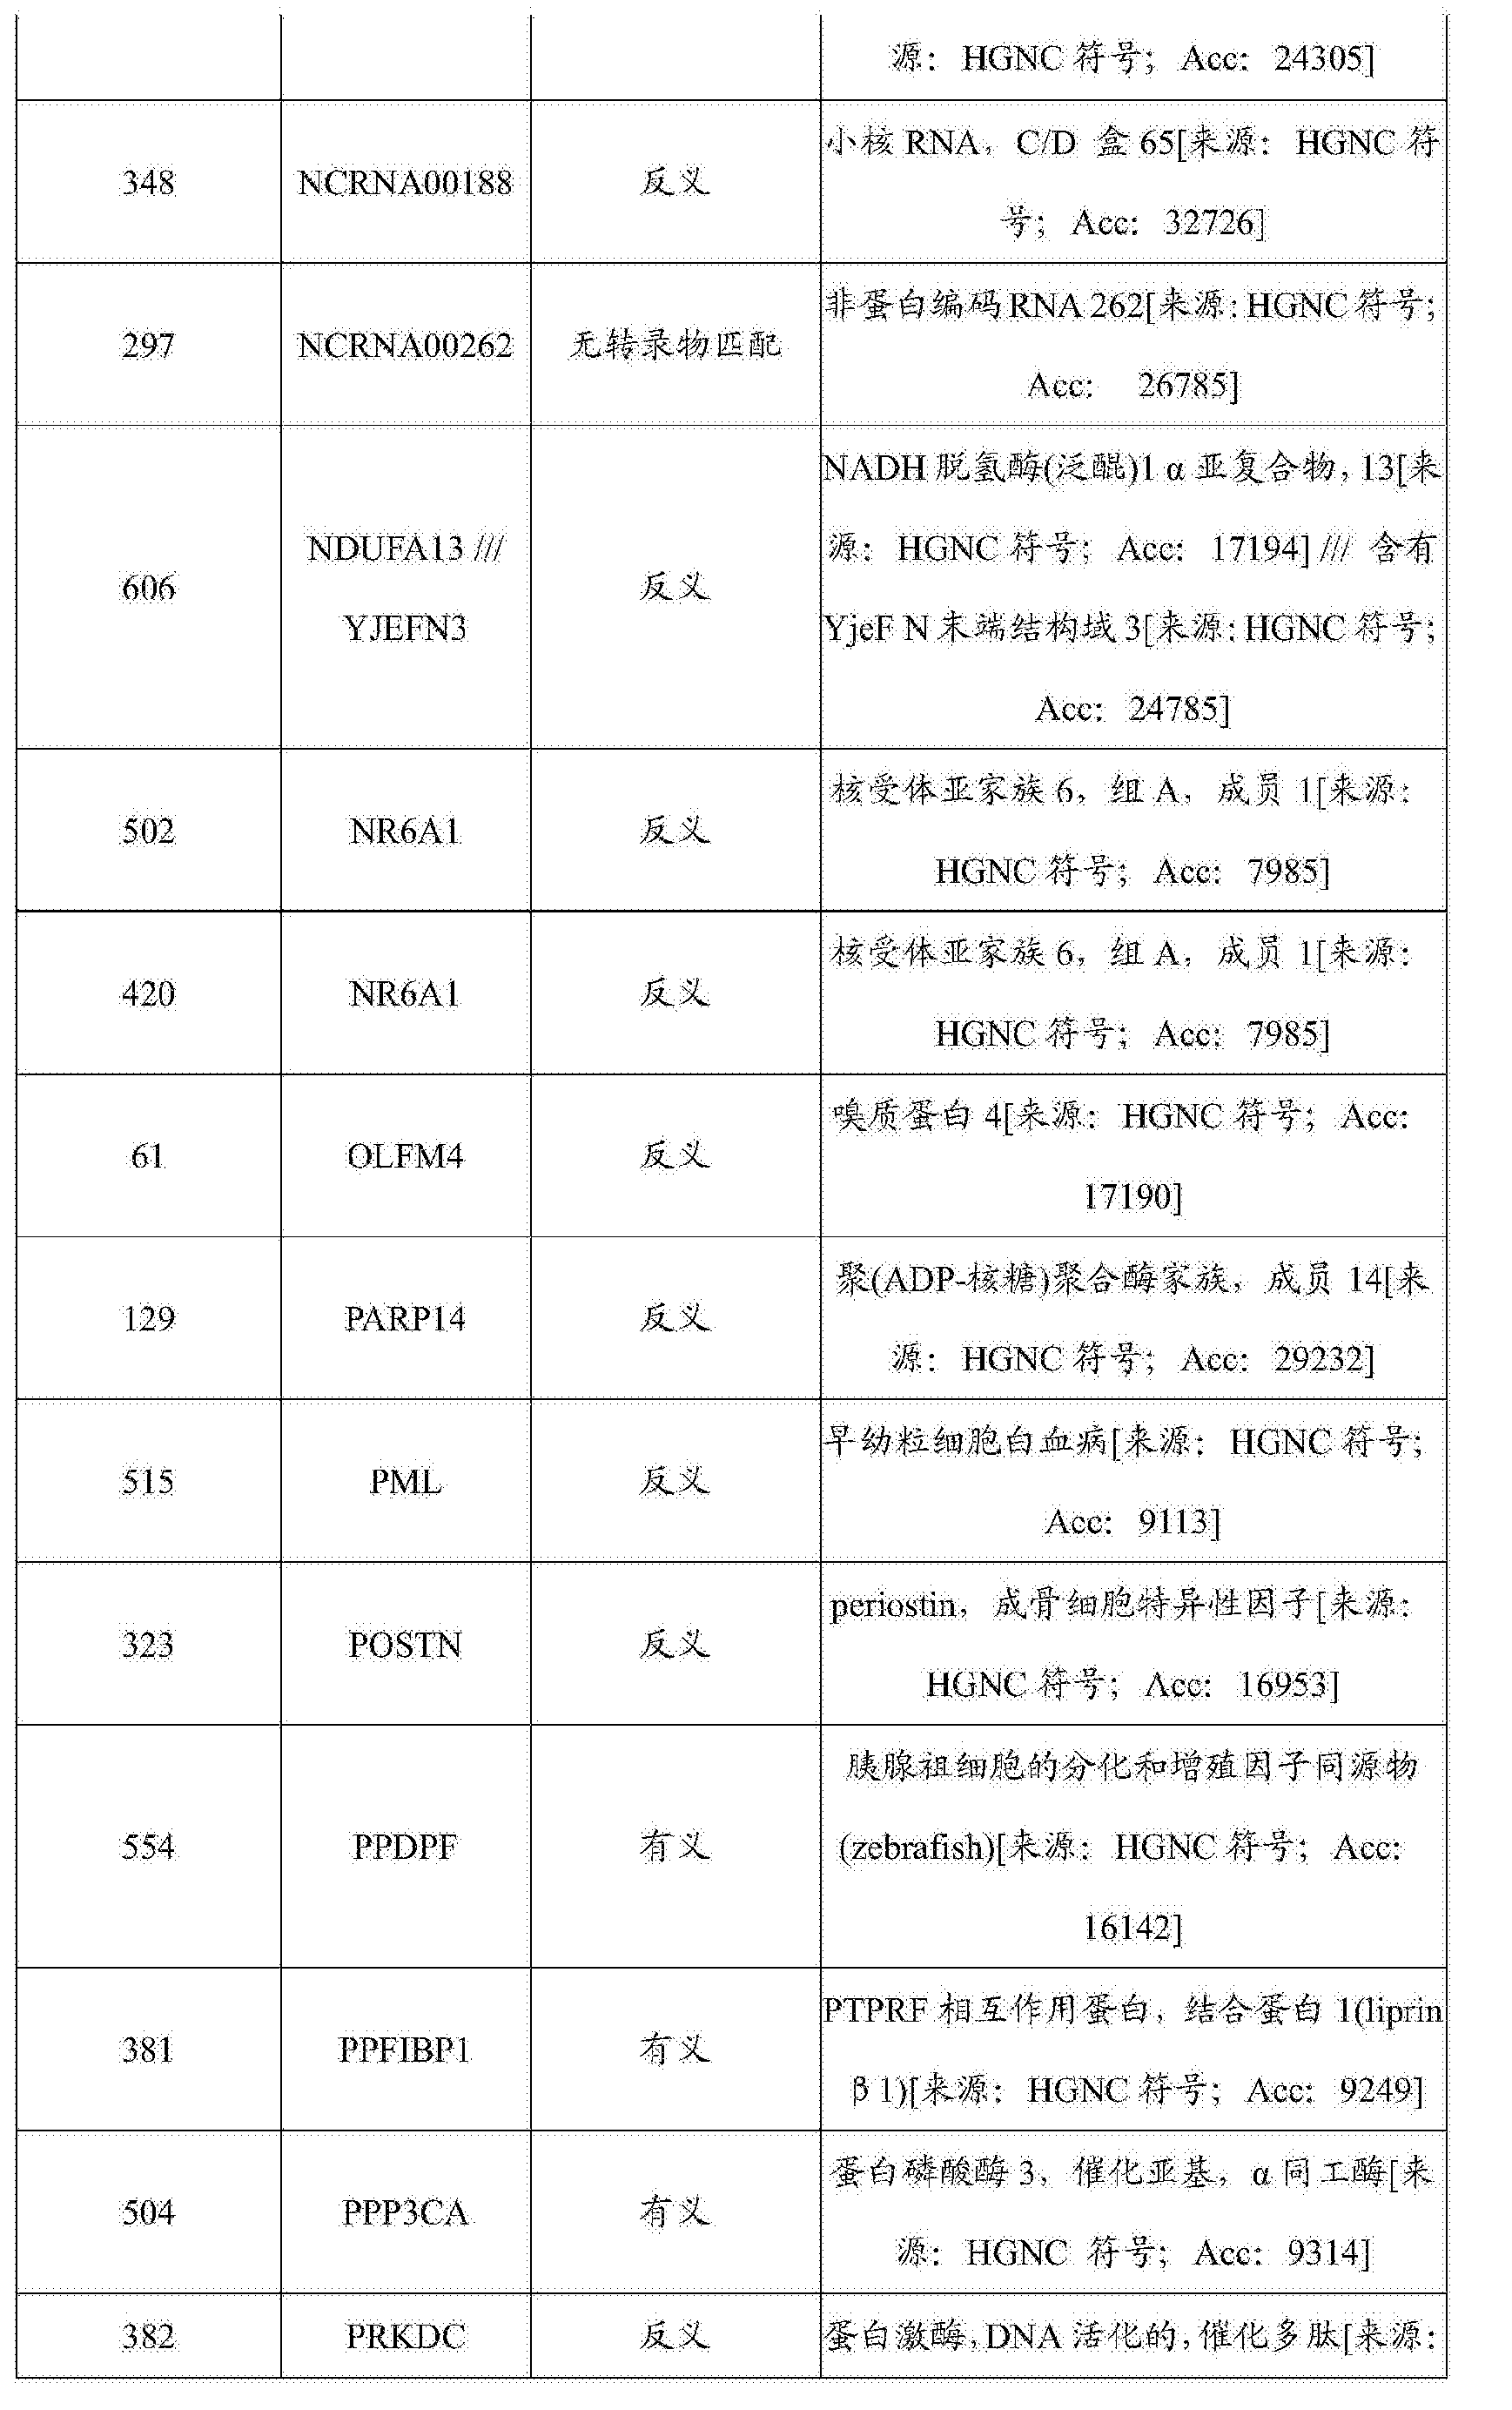 Figure CN103403543B9D00321